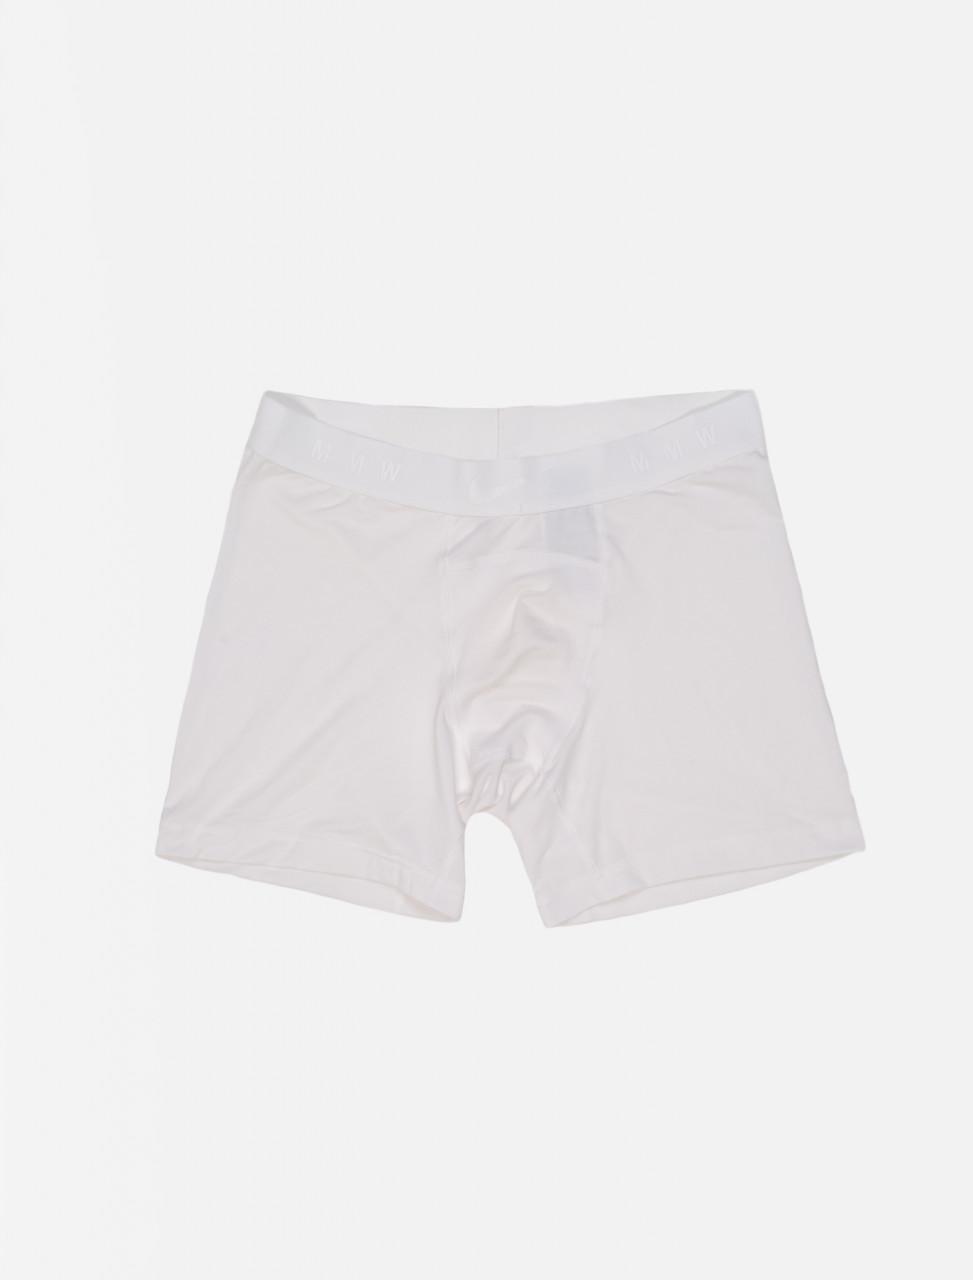 x MMW Menswear Underwear